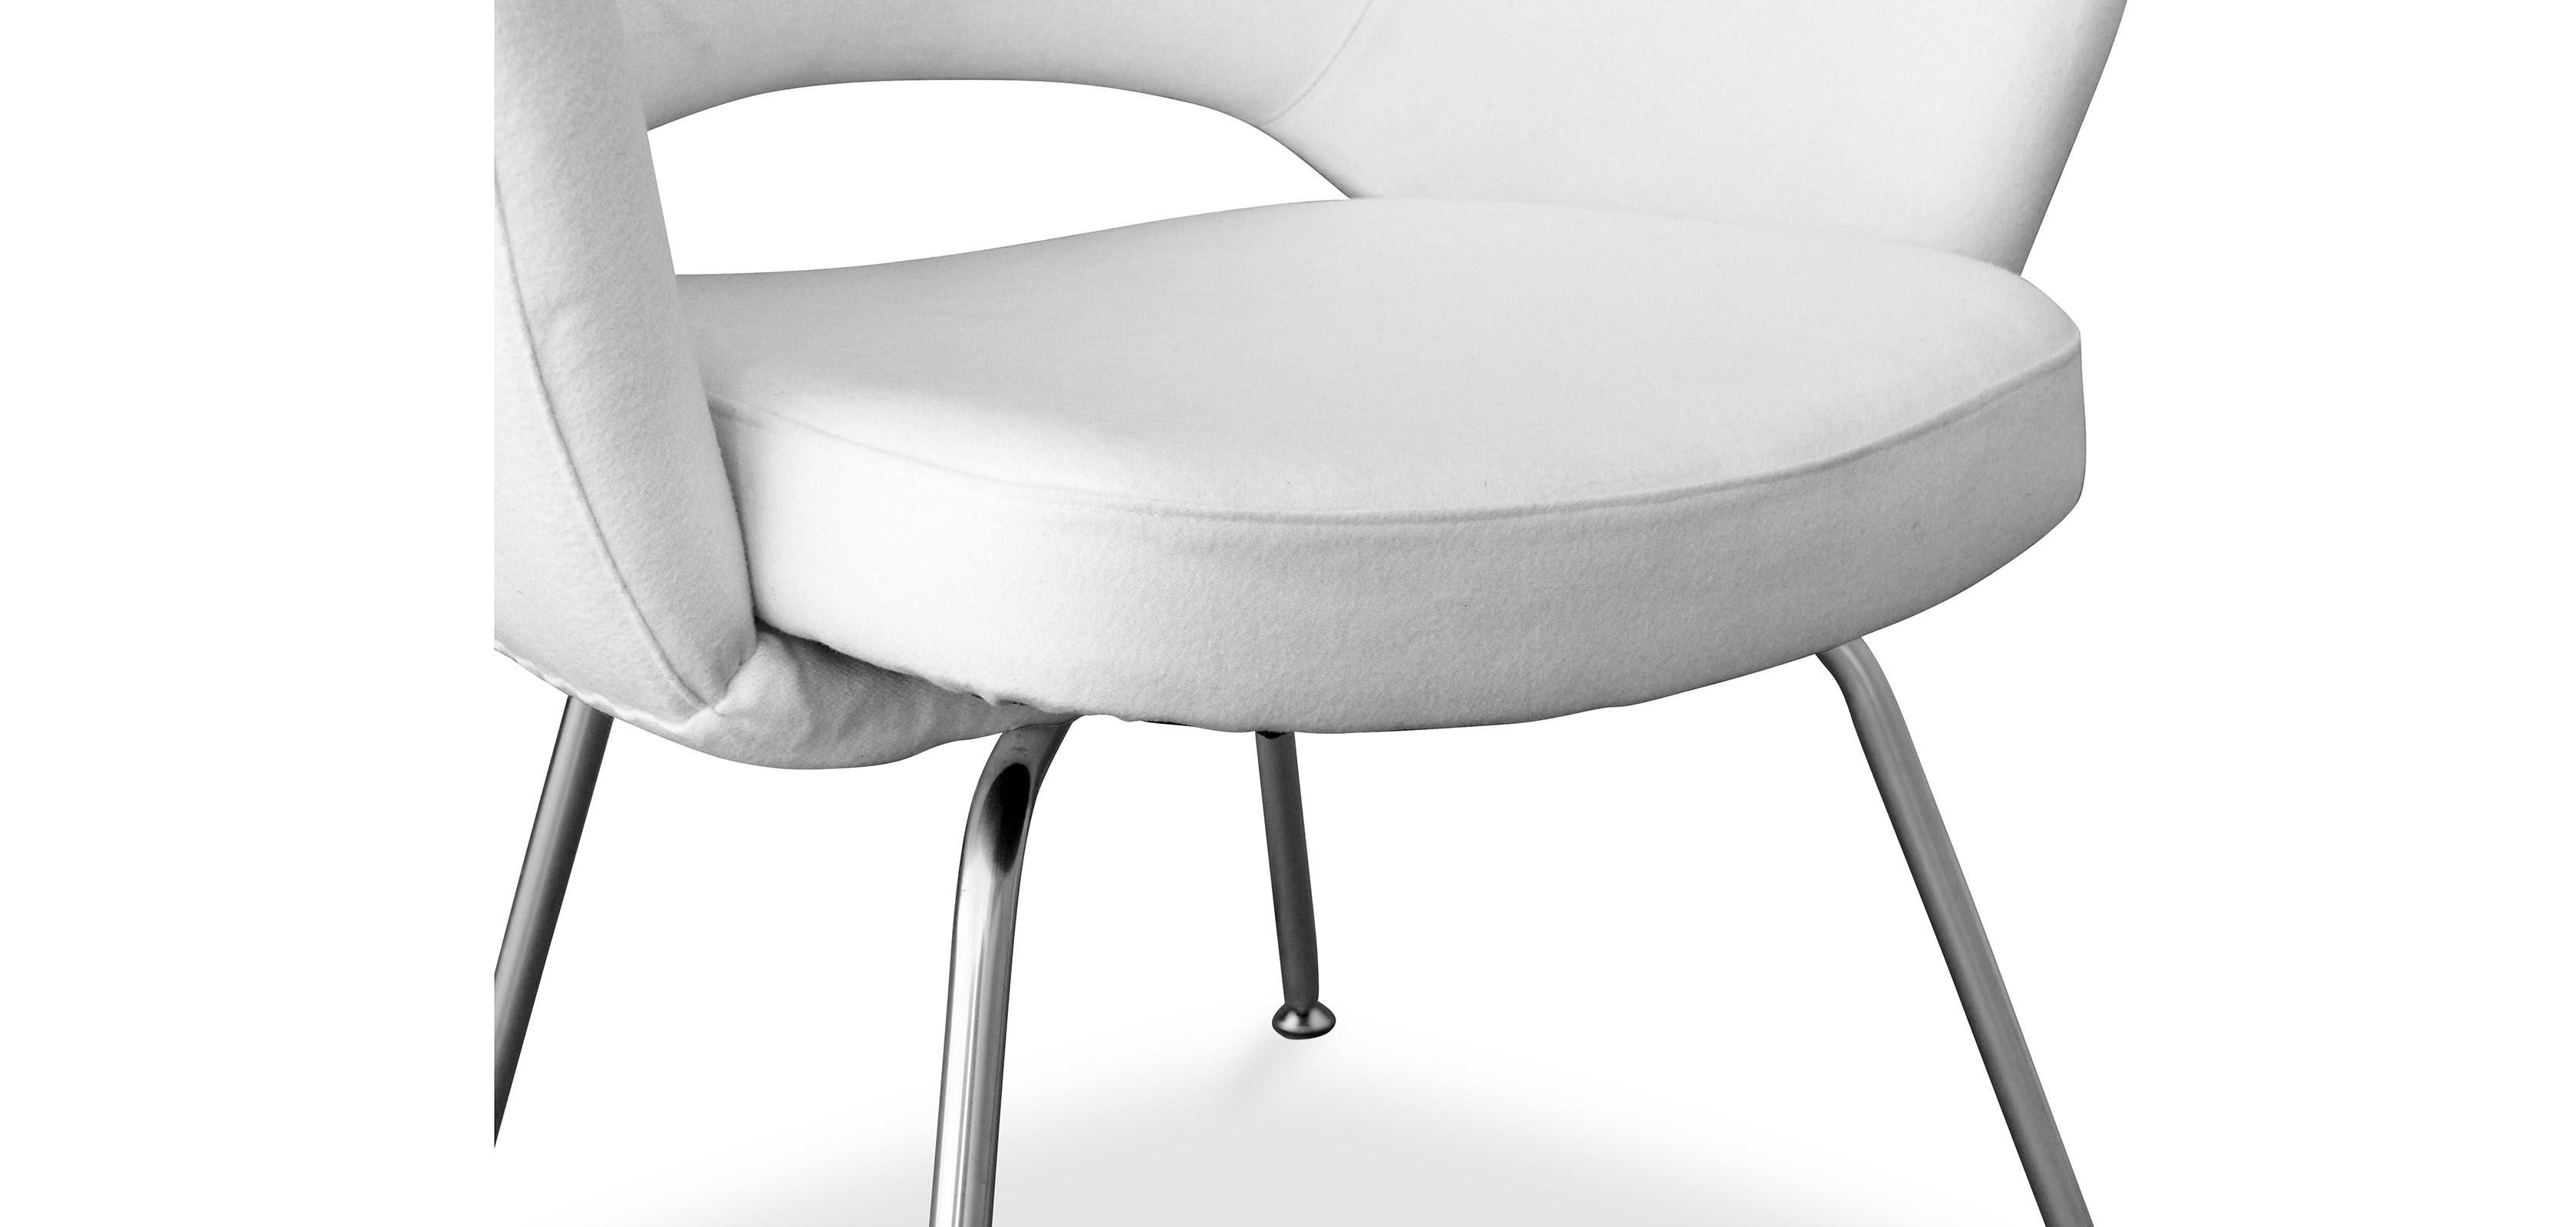 Sedia Executive Eero Saarinen style - Tessuto